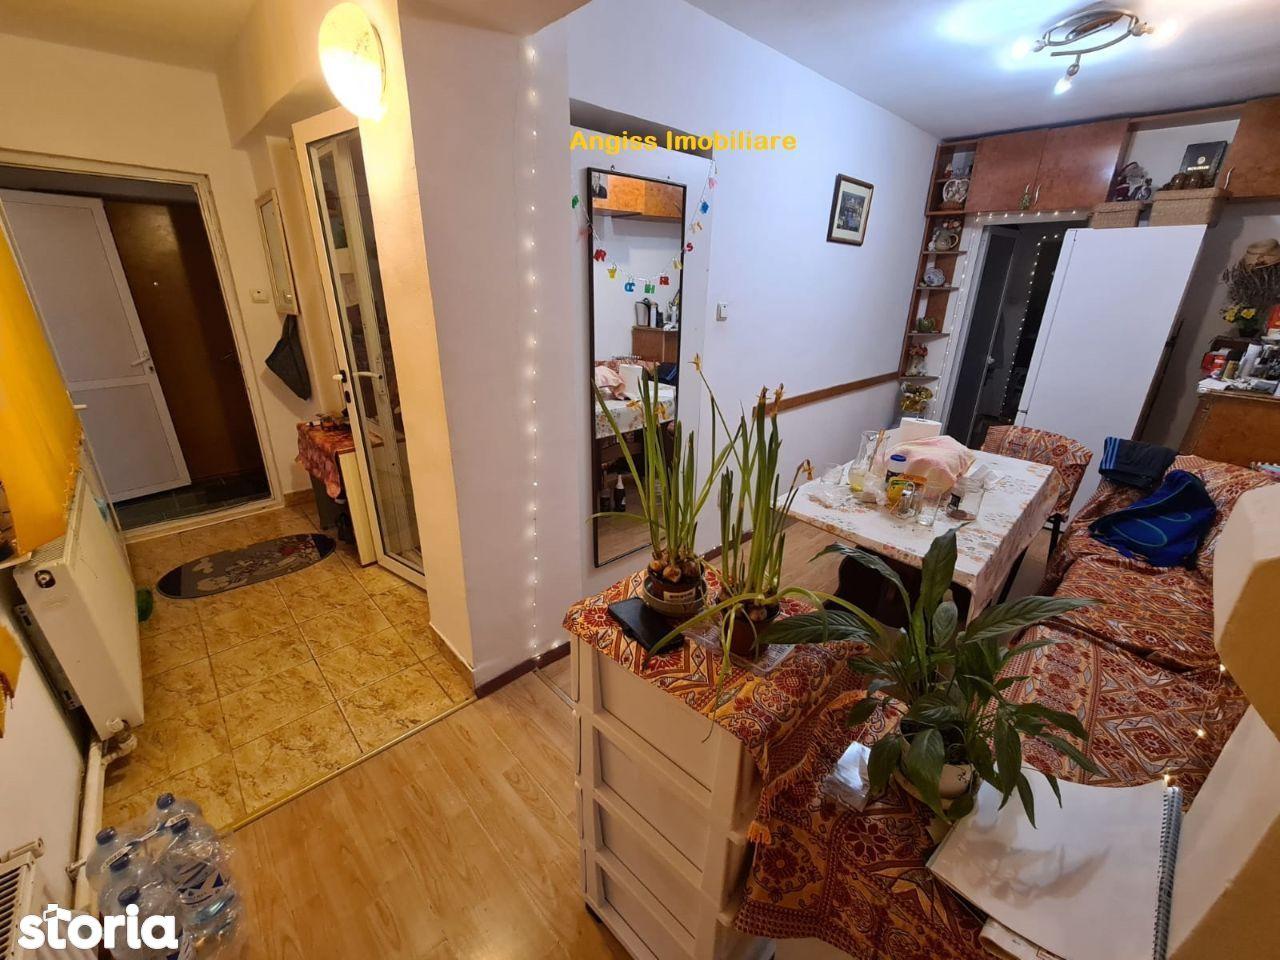 apartament + spatiu comercial . cartier c5 (86mp)